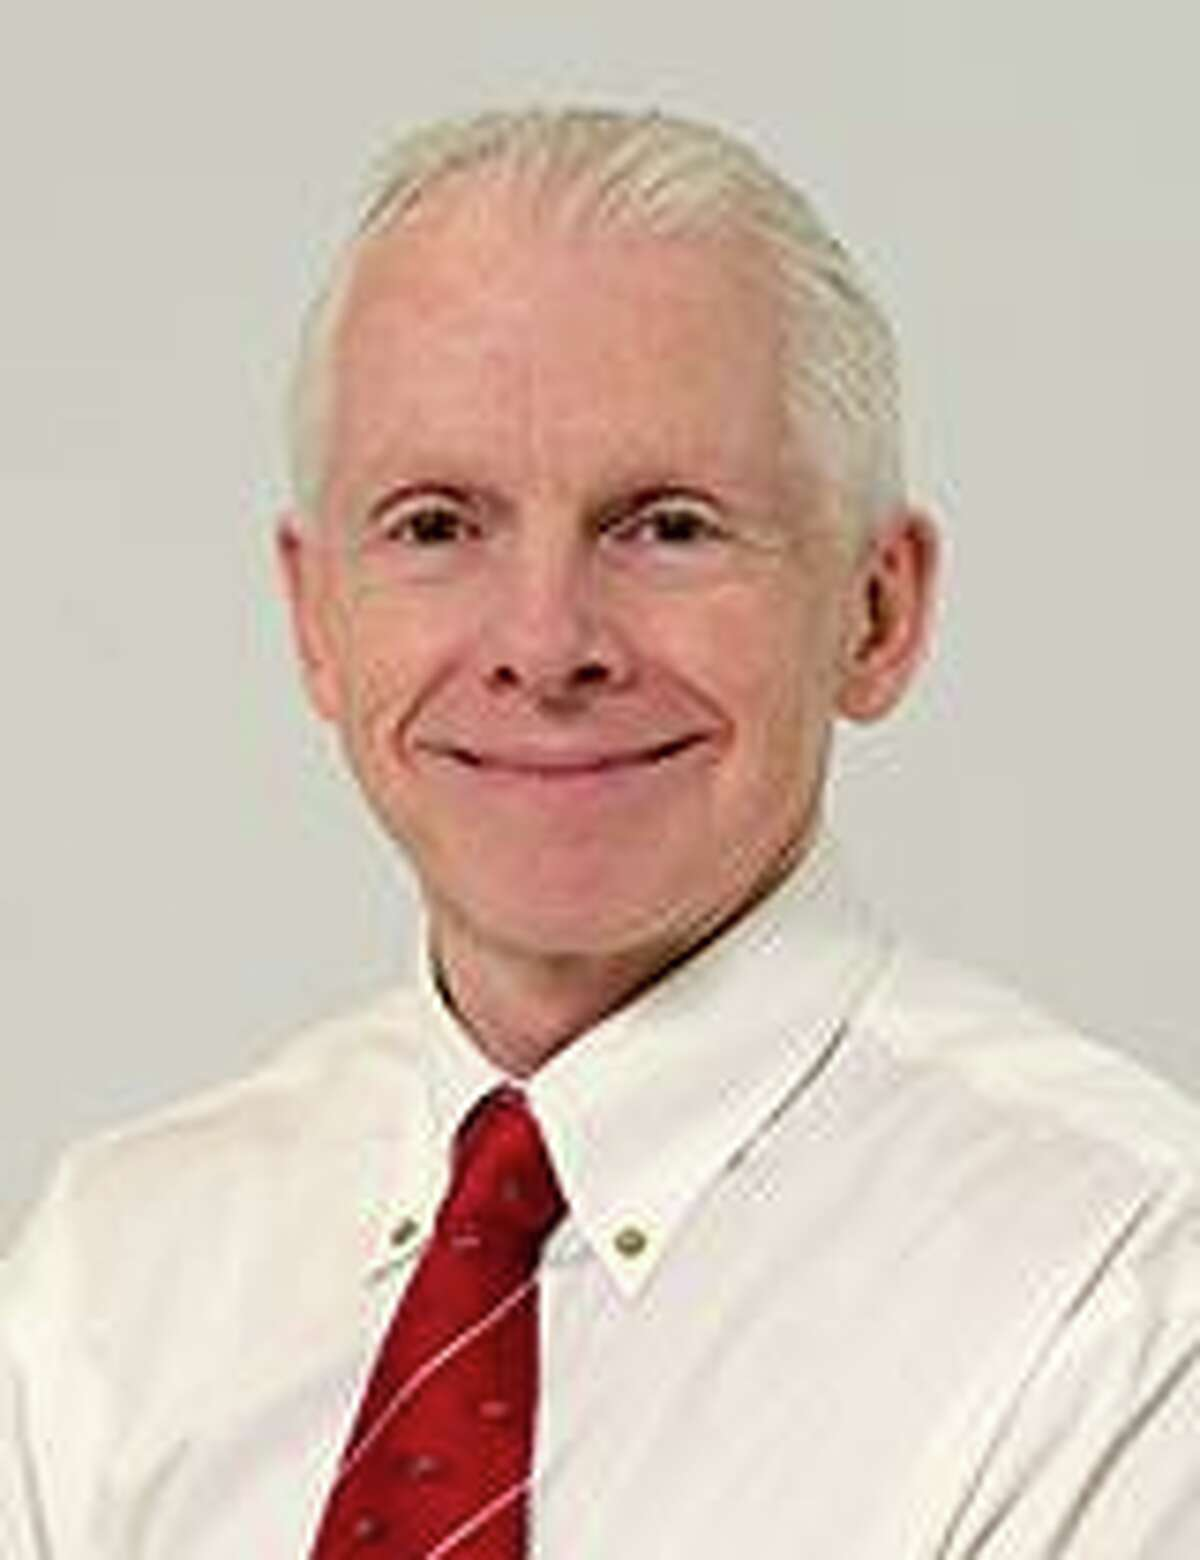 Julian Ford